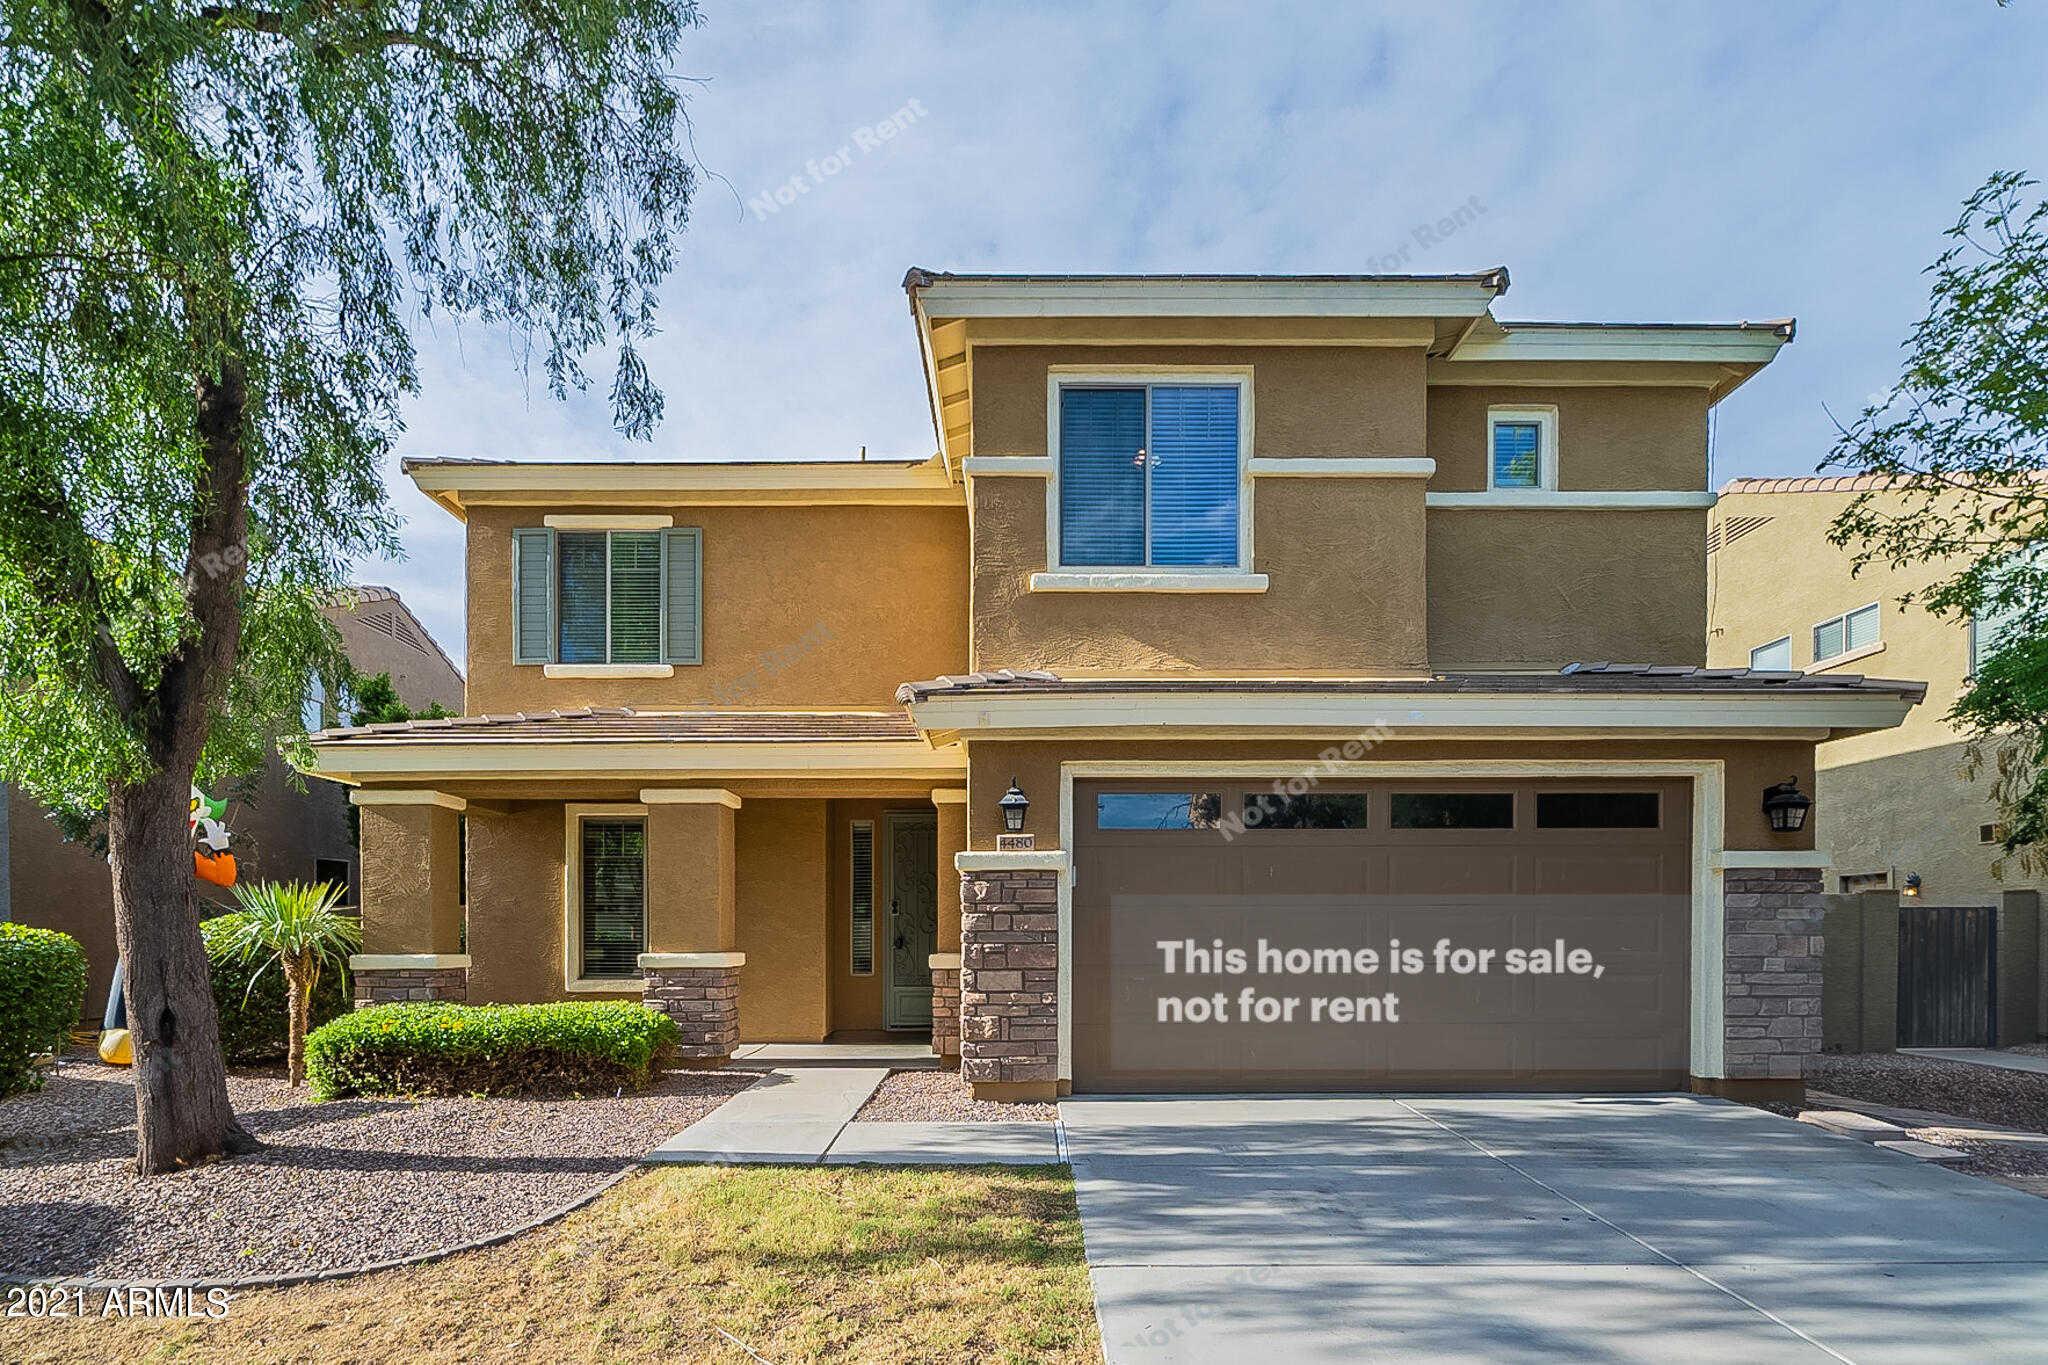 $617,000 - 5Br/4Ba - Home for Sale in Power Ranch Neighborhood 8, Gilbert